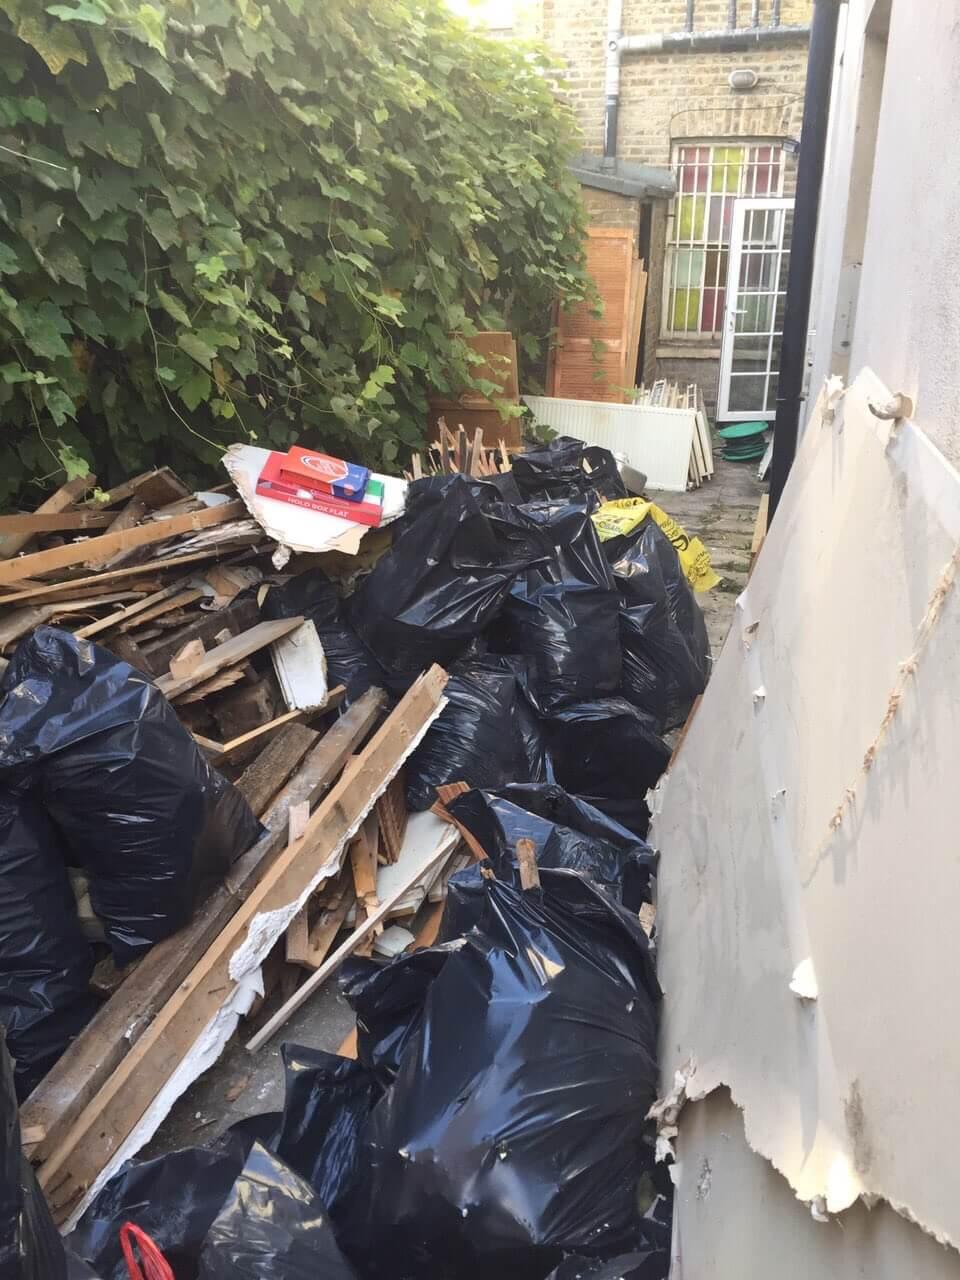 Waterloo house rubbish disposal SW1